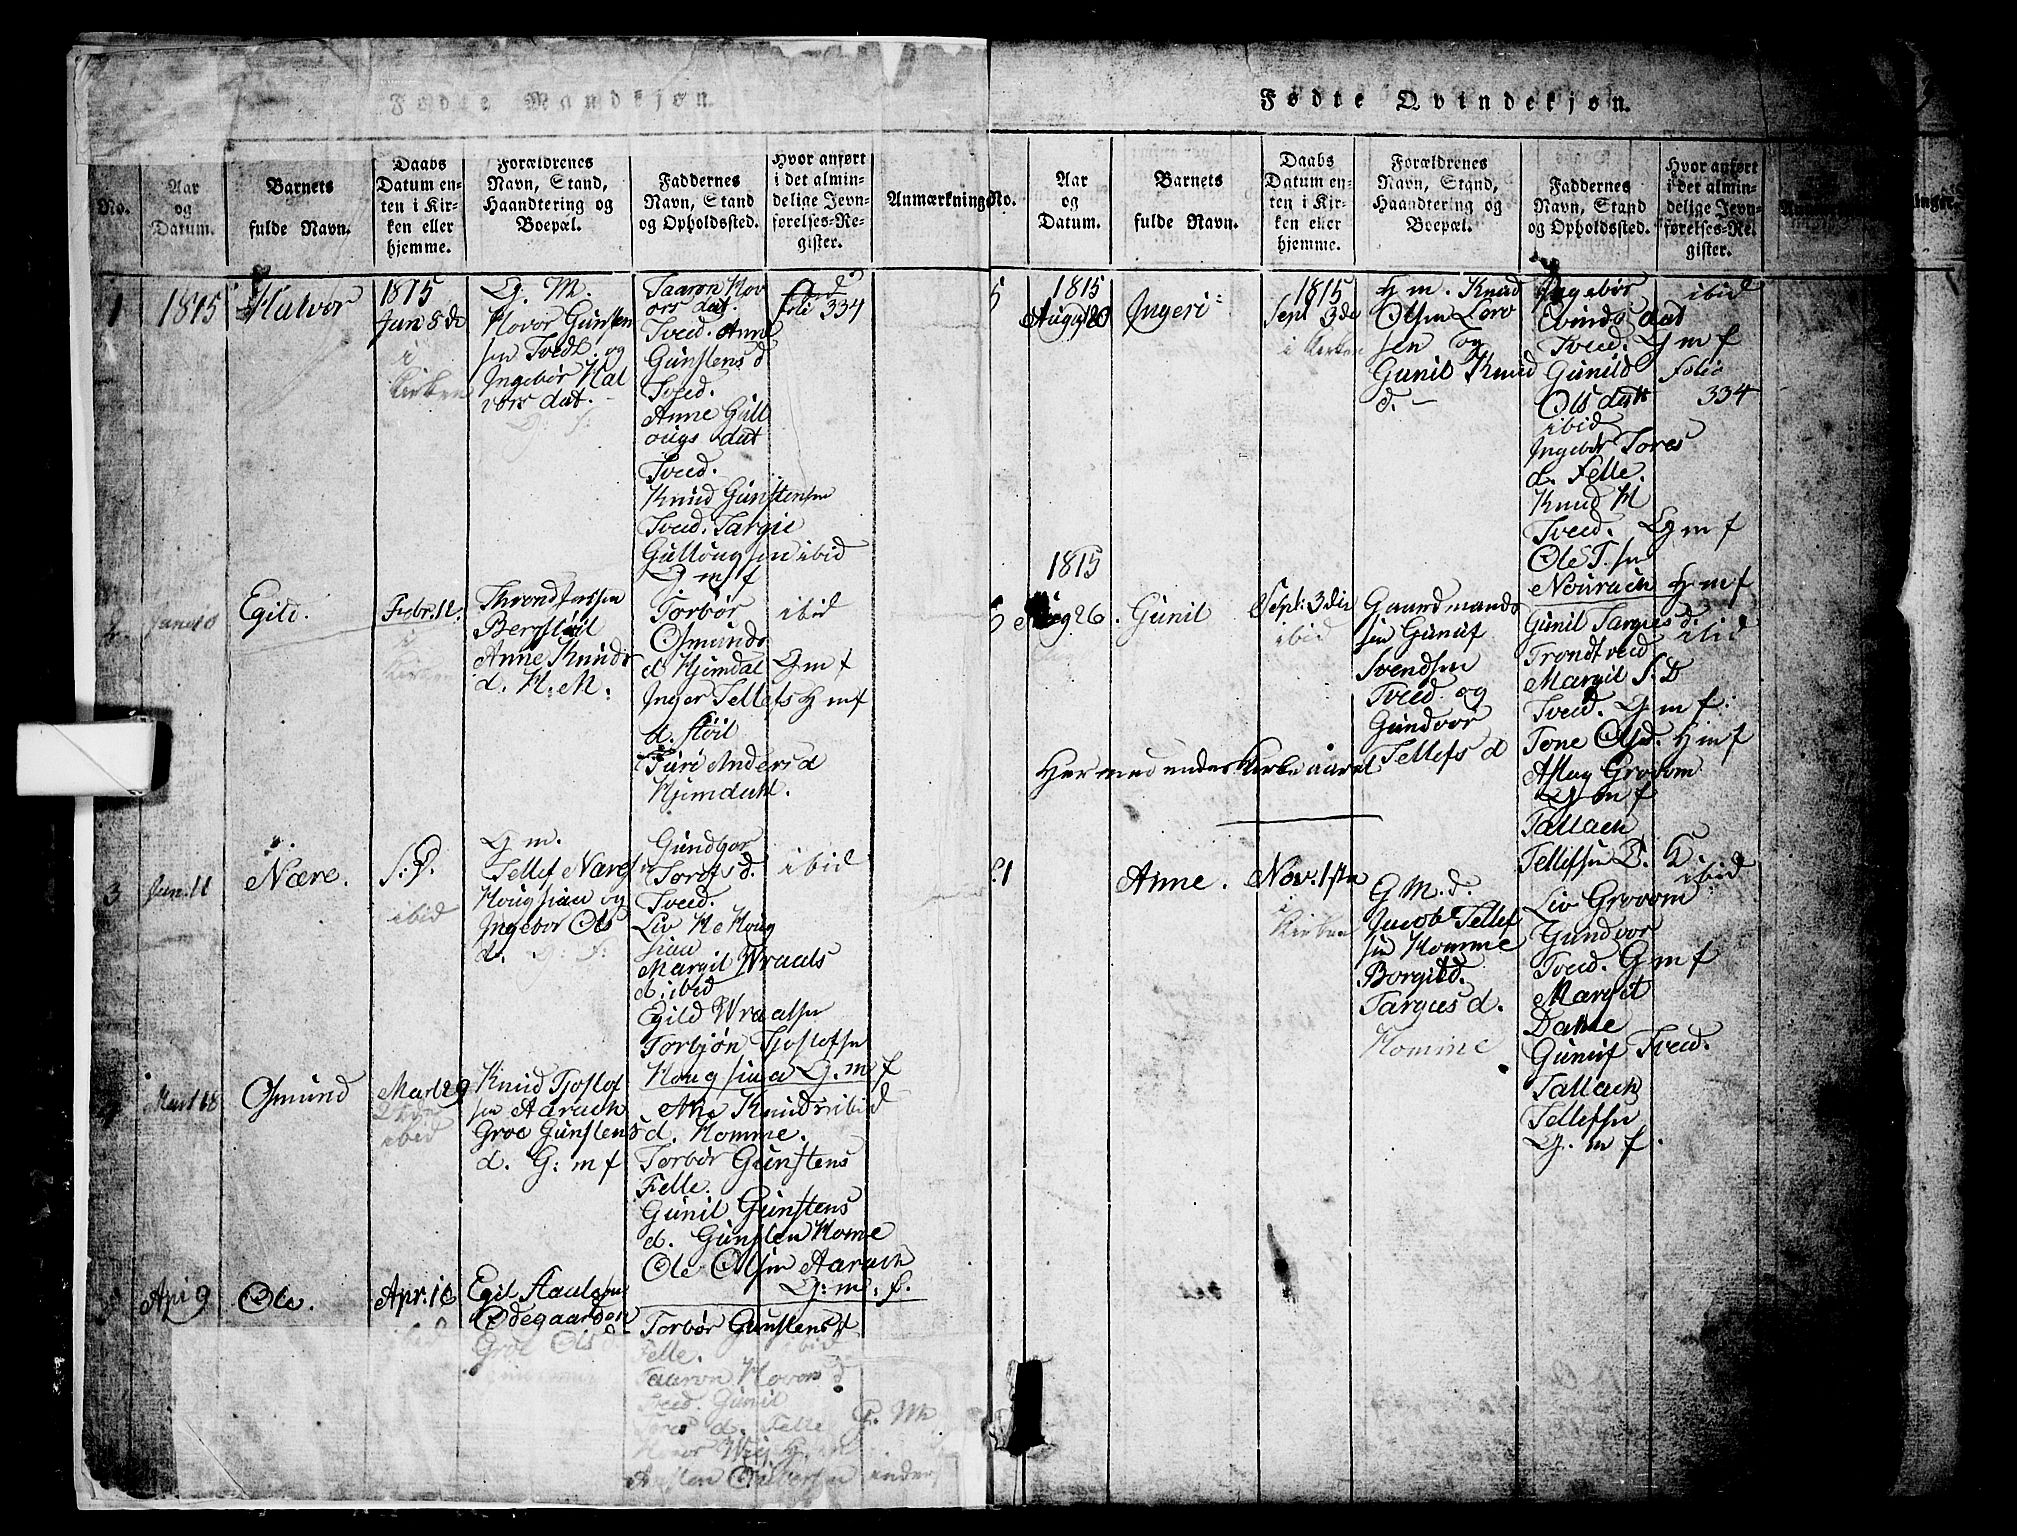 SAKO, Nissedal kirkebøker, G/Gb/L0001: Klokkerbok nr. II 1, 1814-1862, s. 2